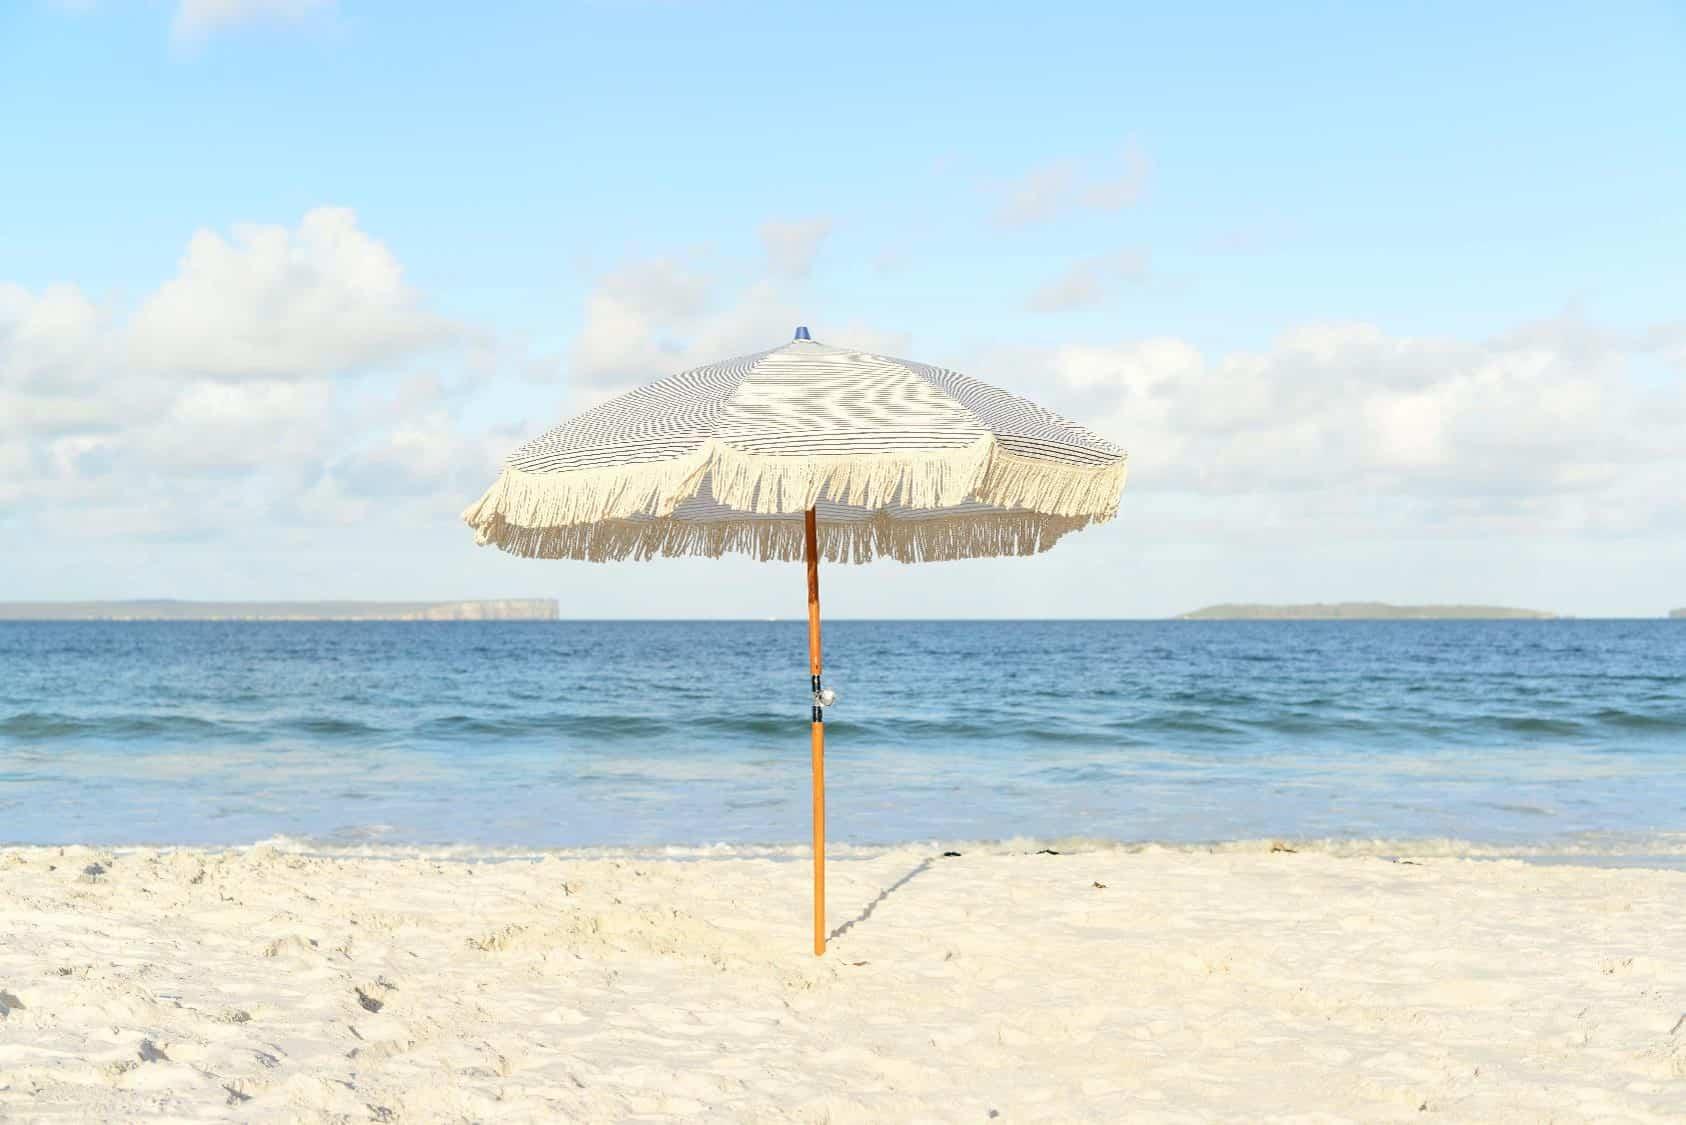 Image of white umbrella on sandy beach